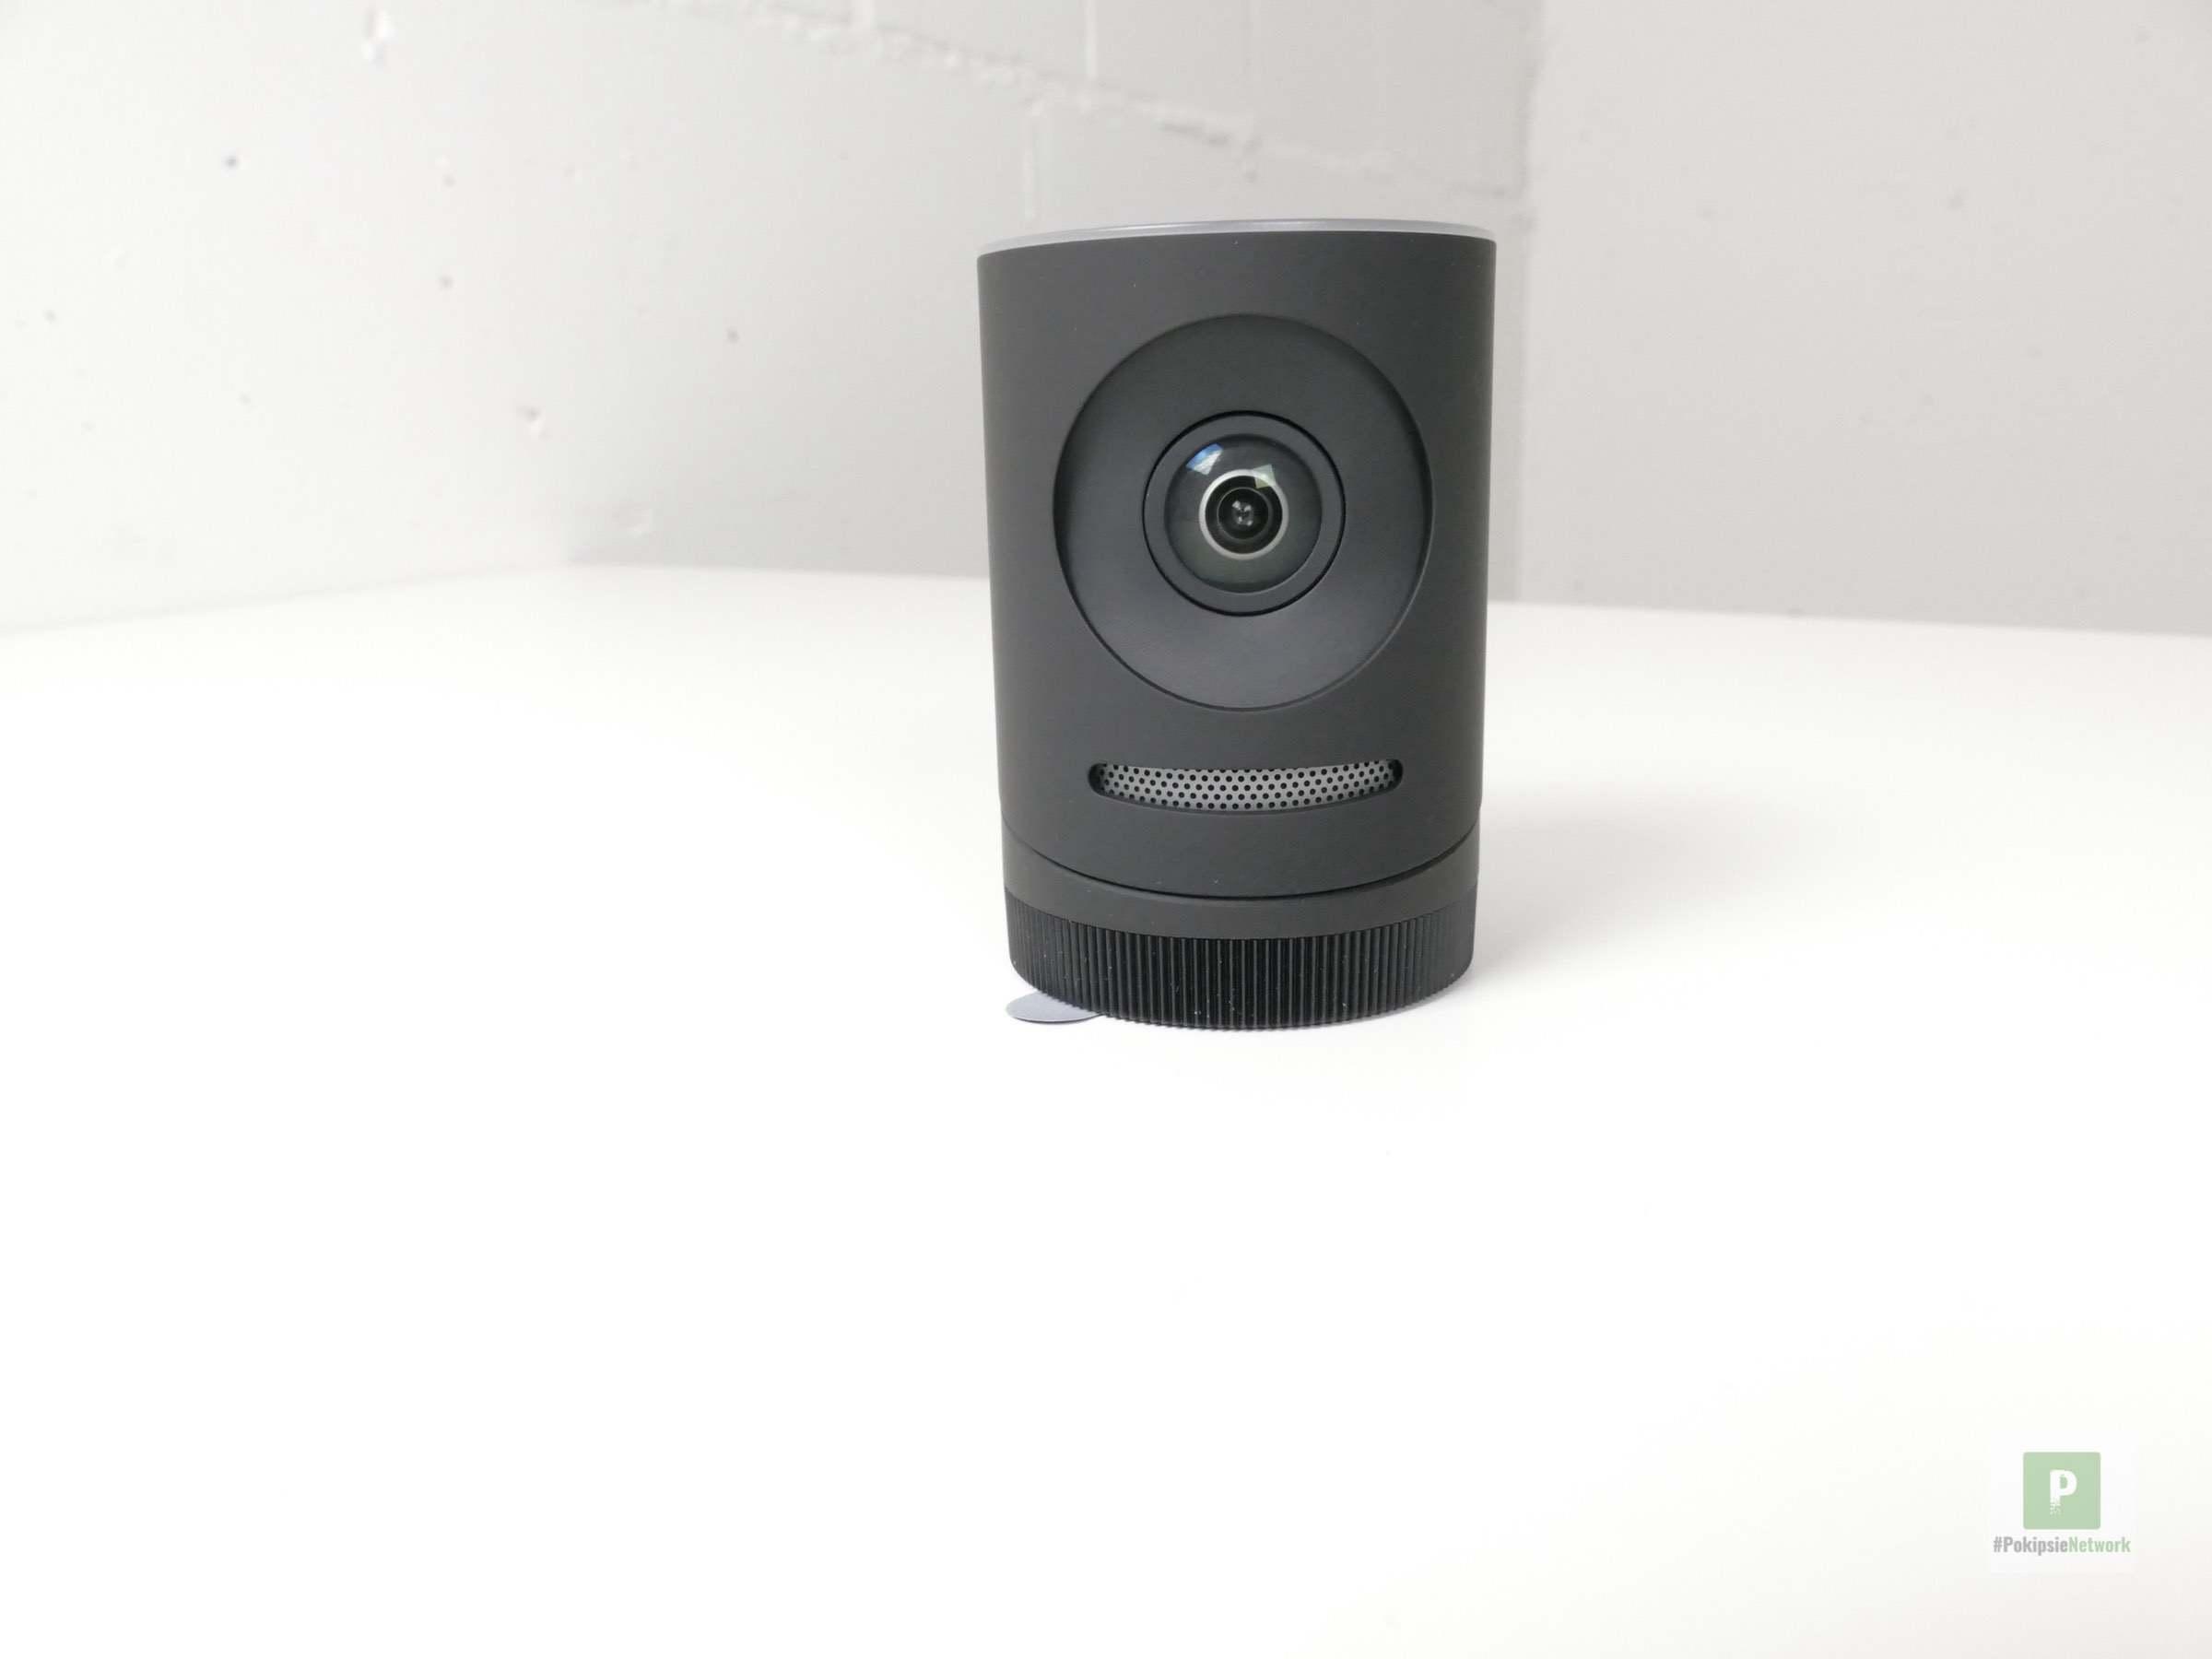 Die Kamera mit dem Mikrofon-Gitter